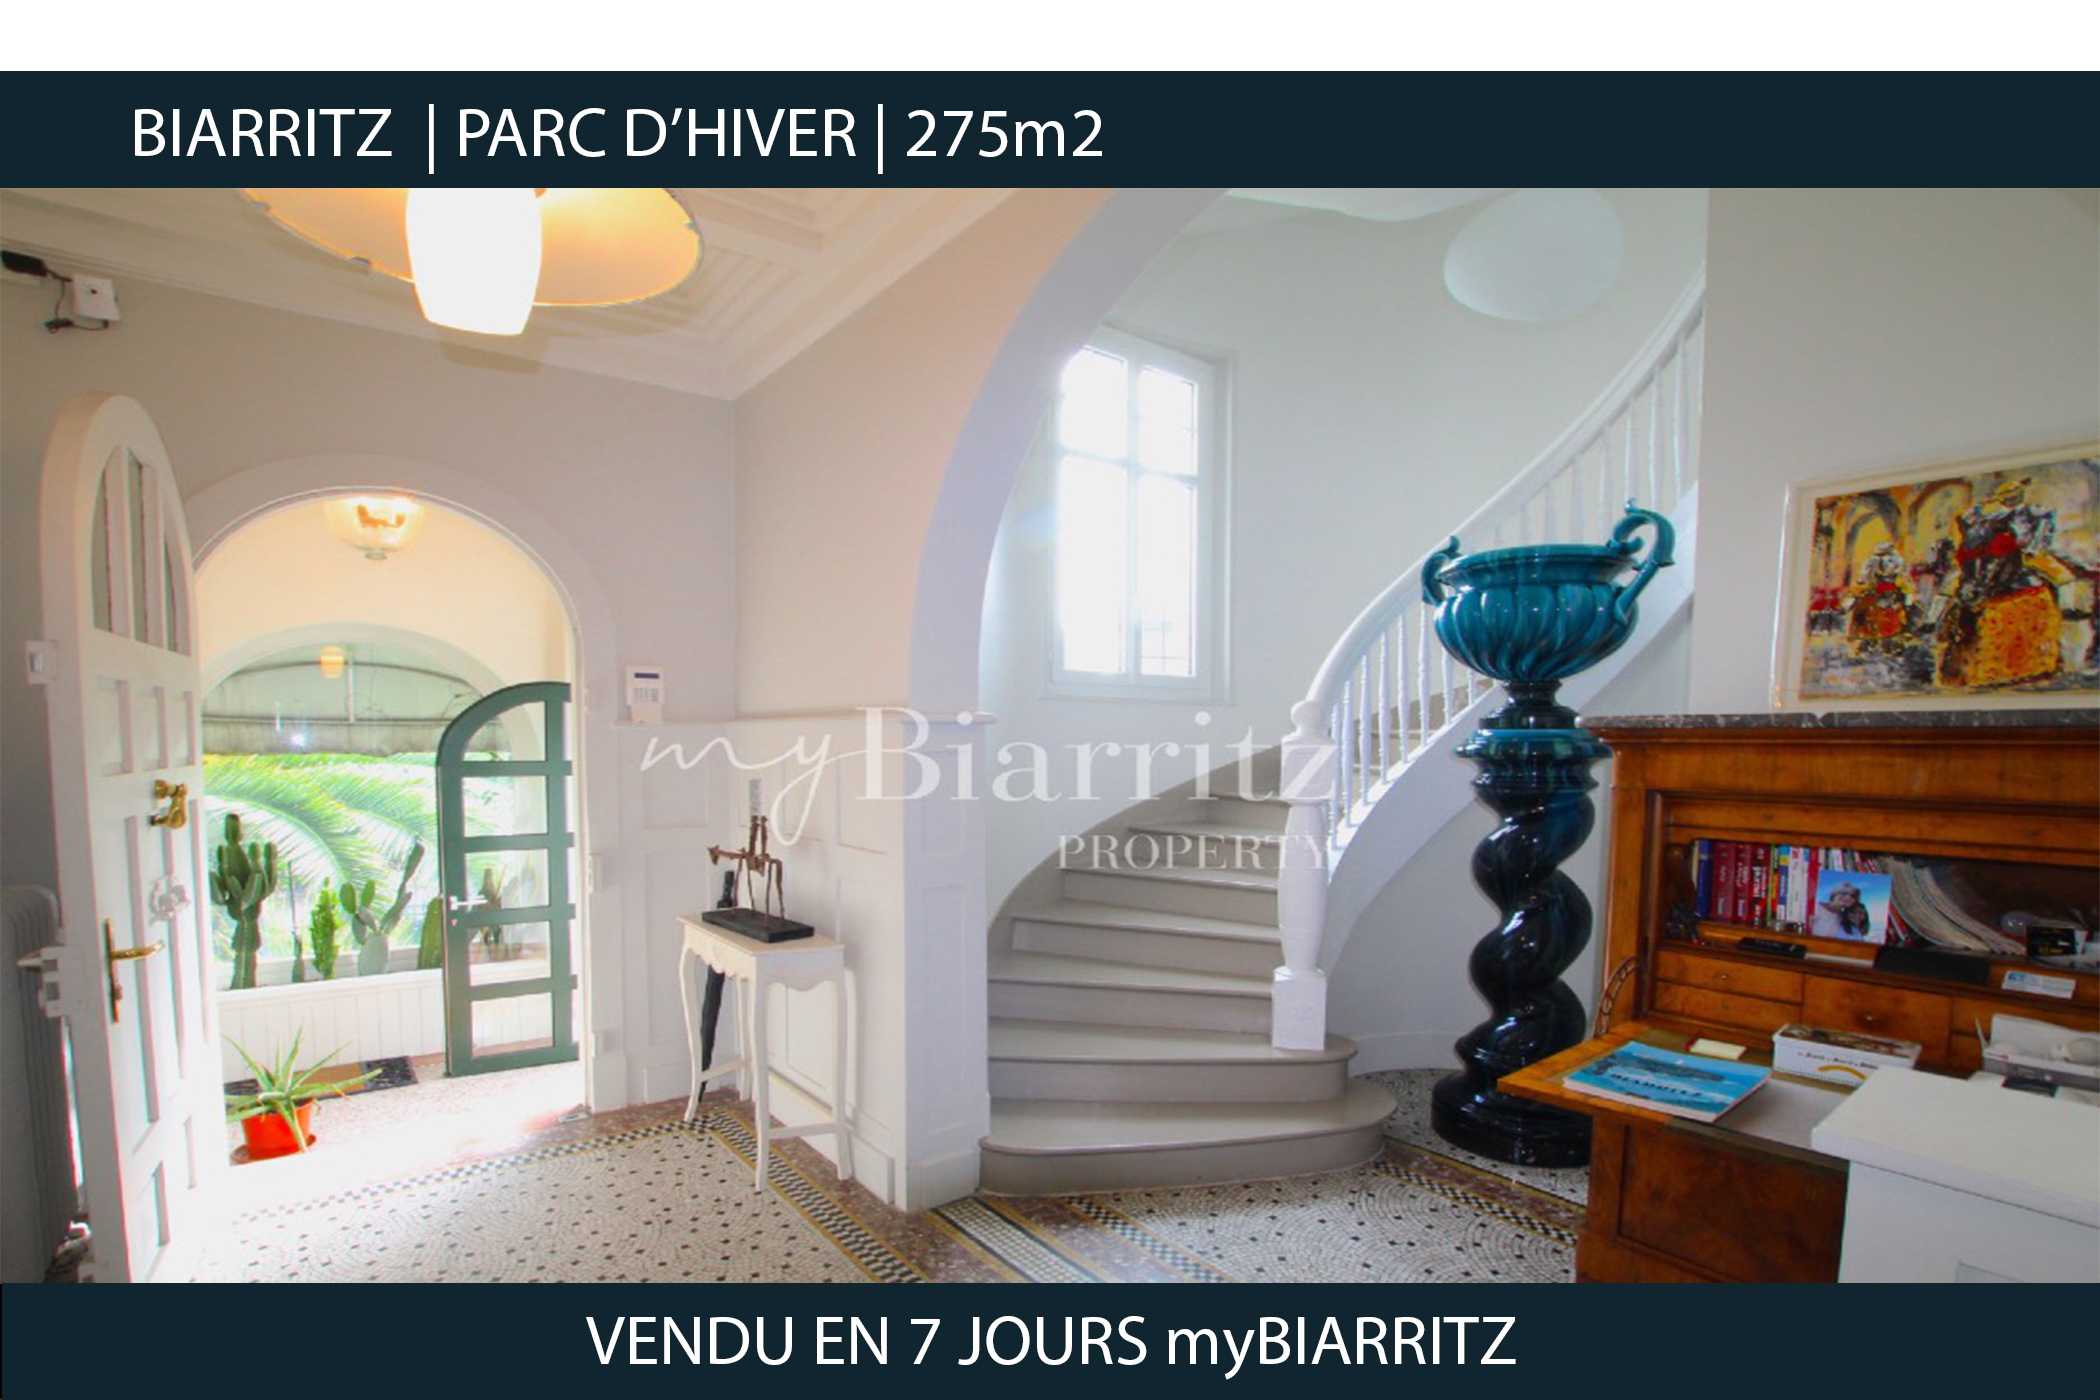 Biarritz--Parc d'hiver